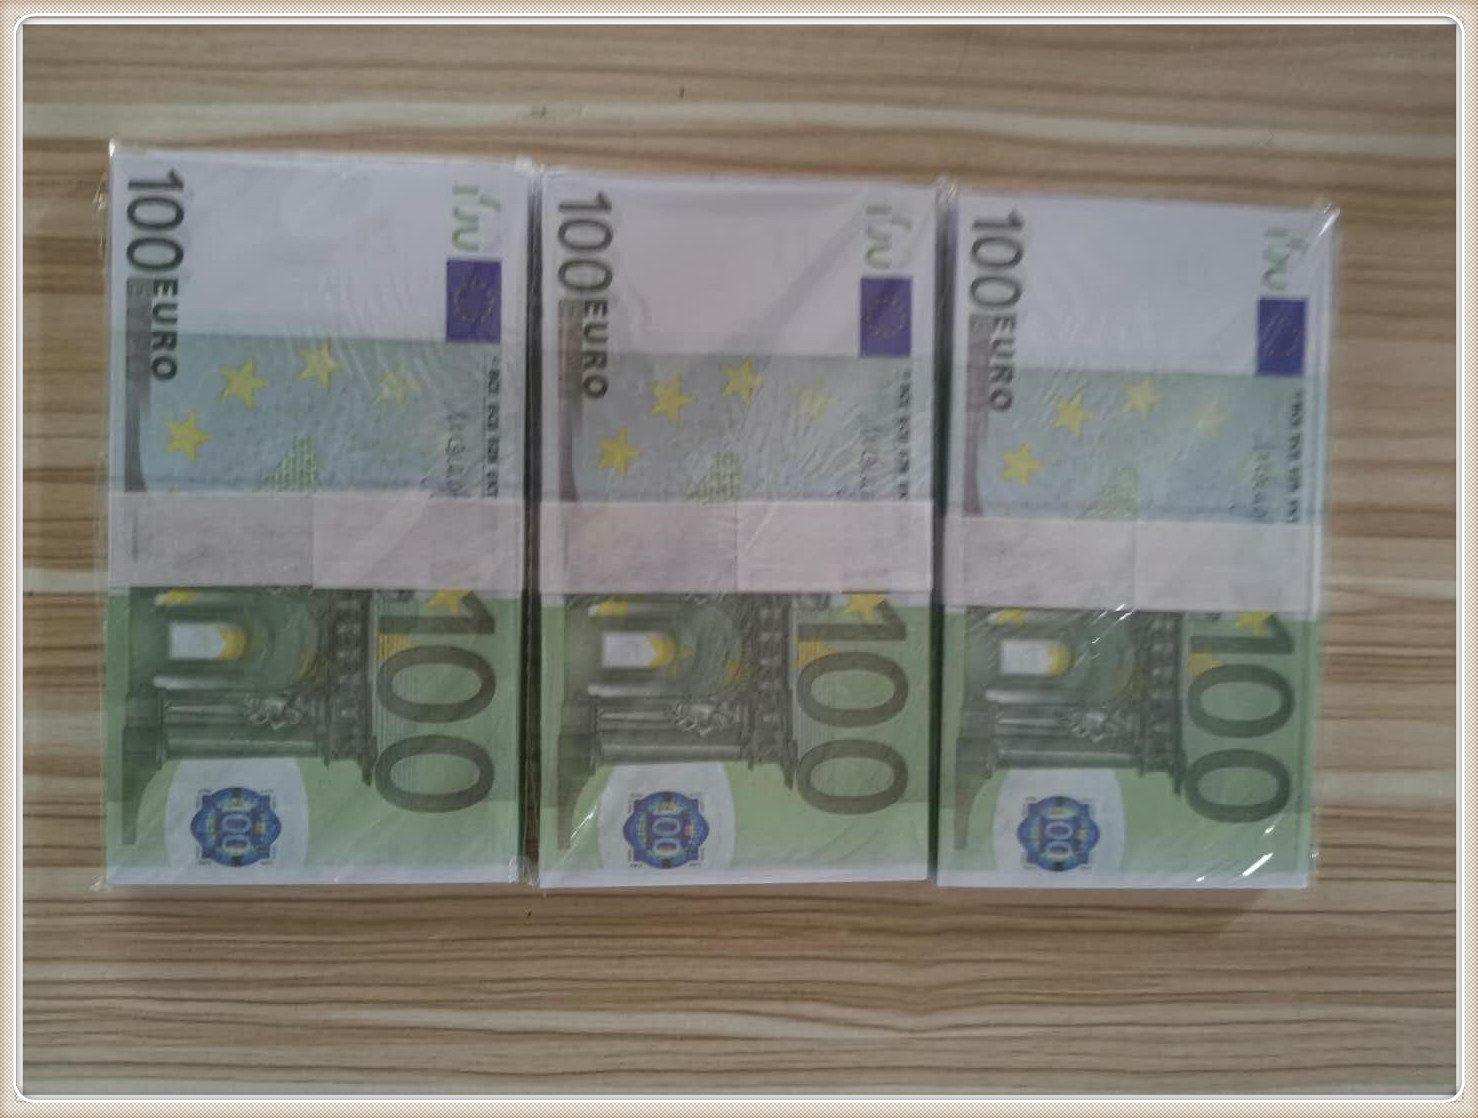 New Magic Billet Gift Money Paper Euro 100 juguete falso Euro Boleto EURO Niños LE100-21 Faux Prop Sops LQGFW CRCLO